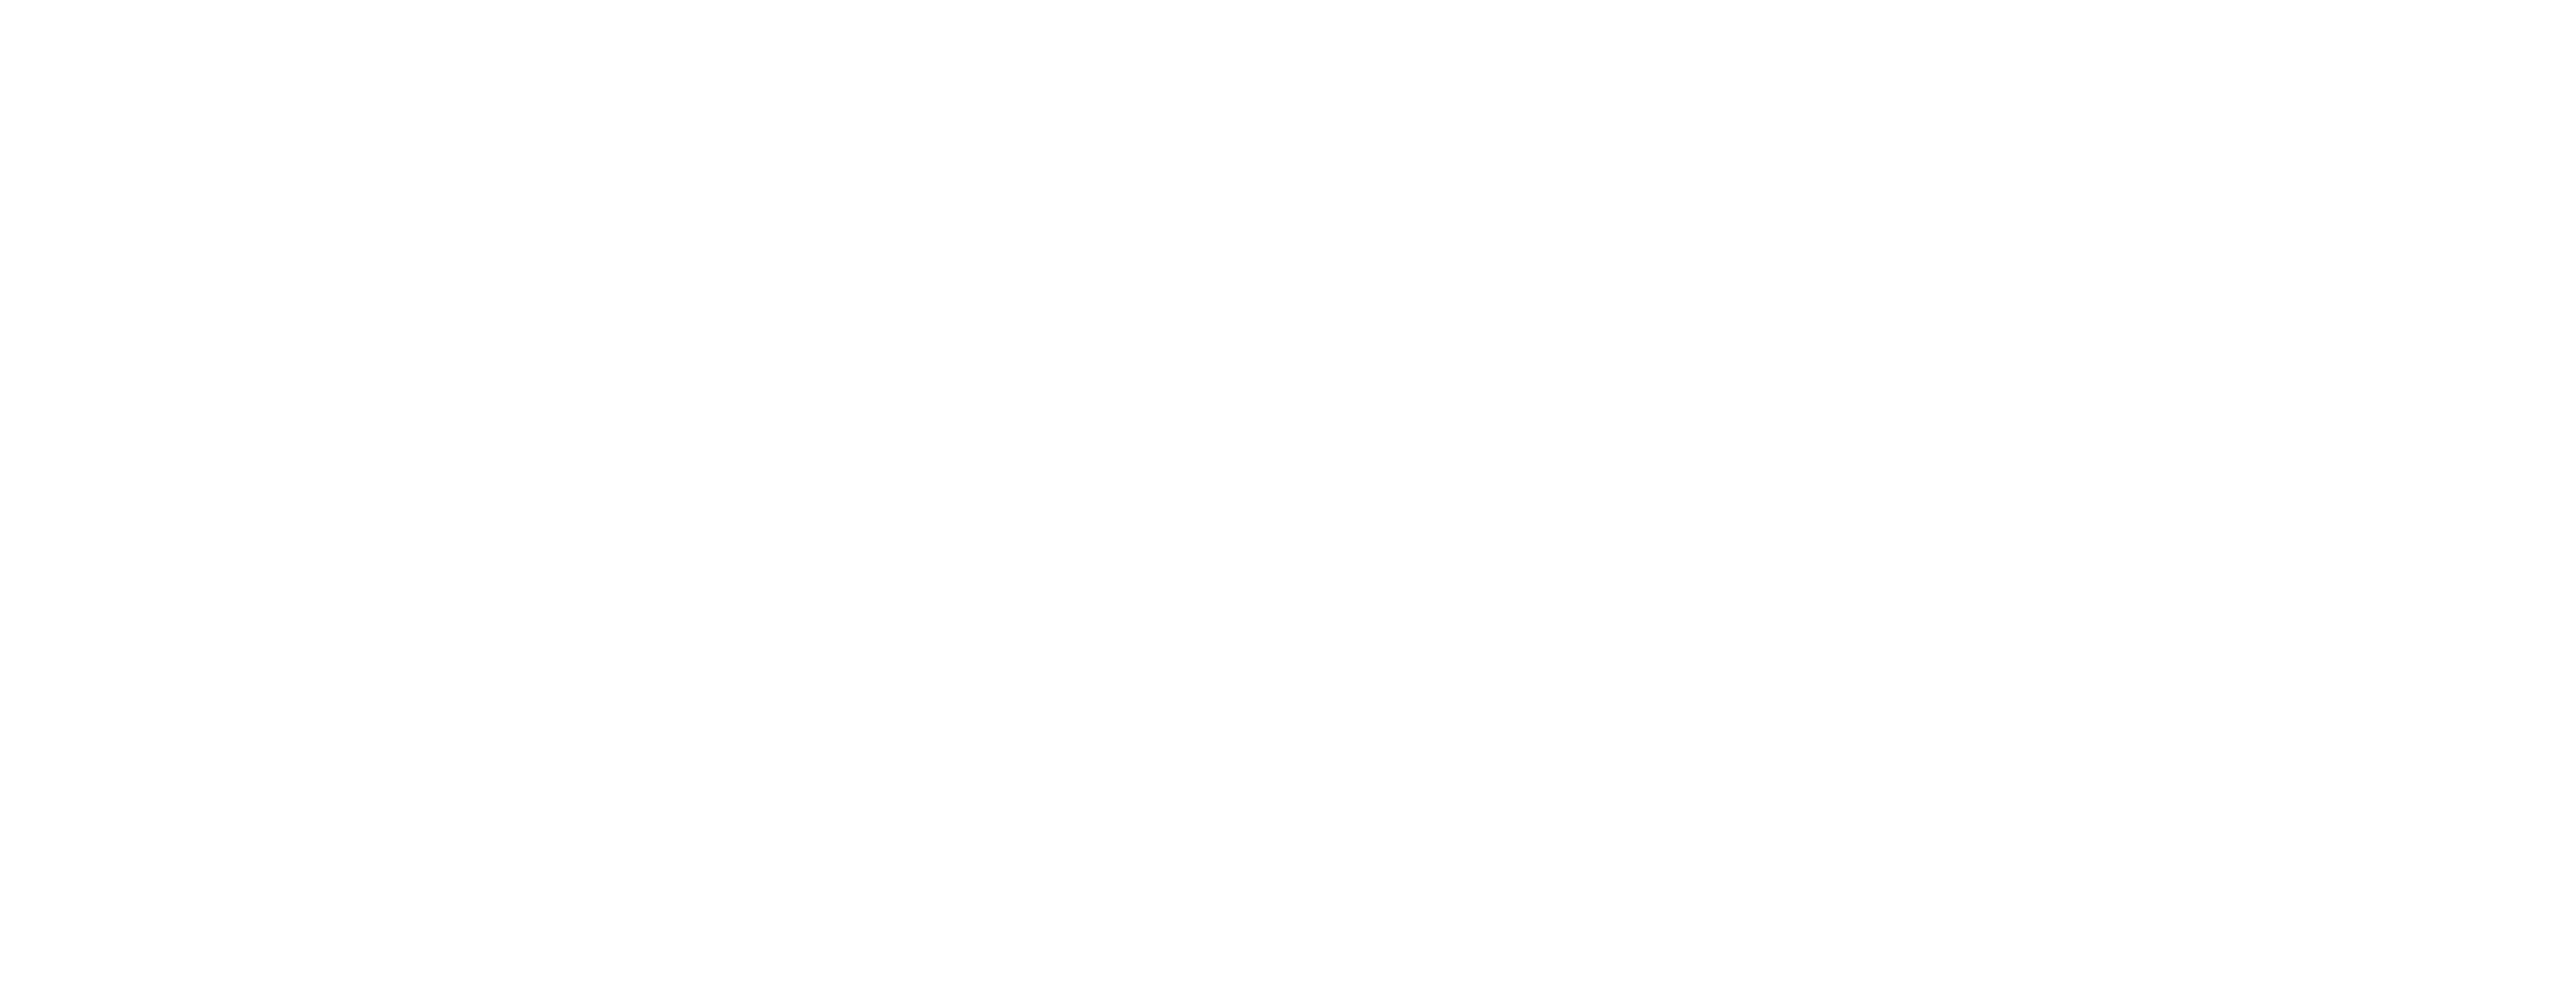 Logo_LEurope_sengage_FSE_2017_Quadri-Reserve